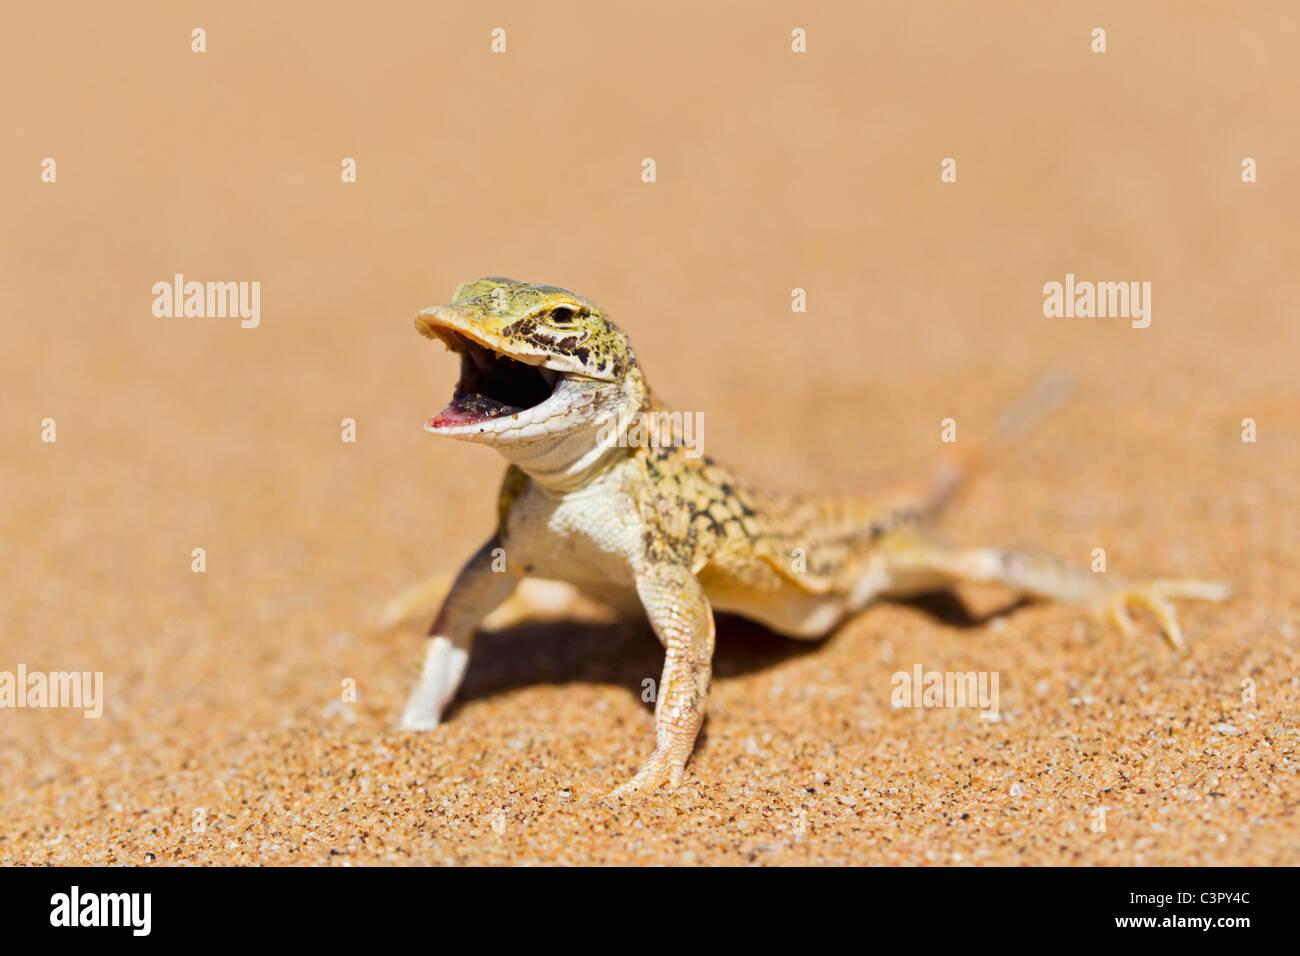 Africa, Namibia, Shovel-snouted lizard in namib desert Stock Photo